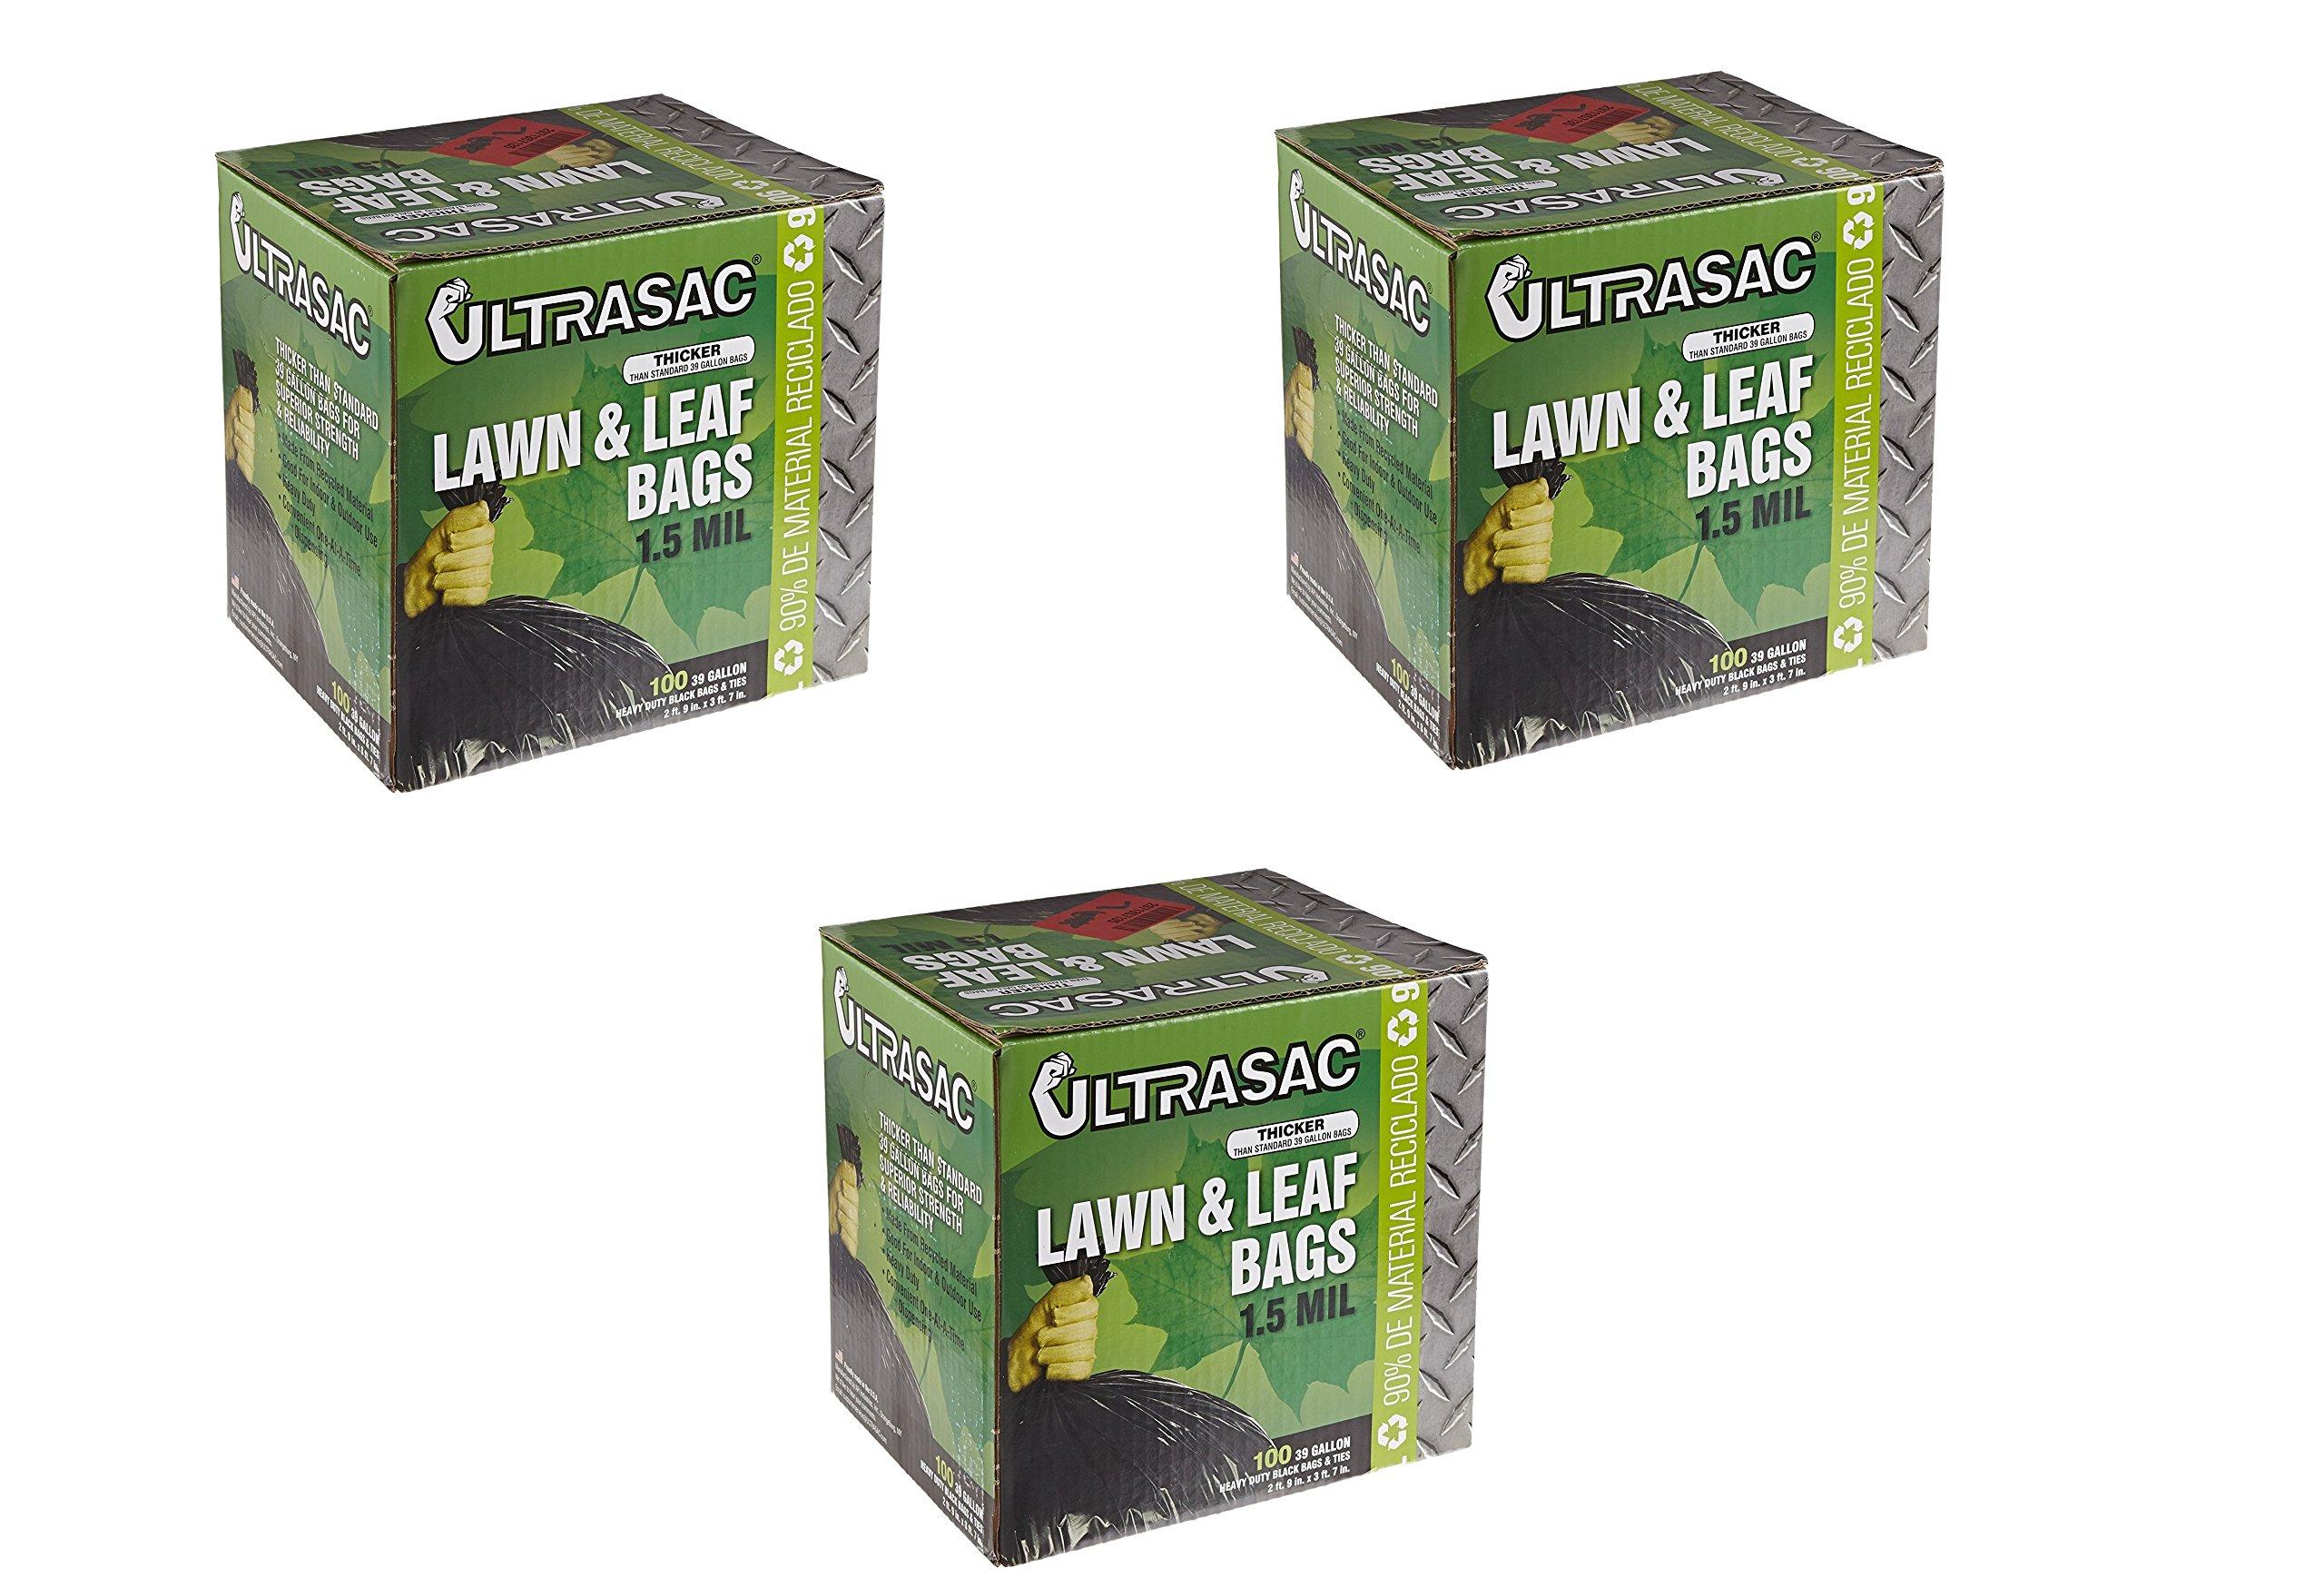 Aluf Plastics 769646 Ultrasac Heavy Duty Professional Quality Lawn and Leaf Trash Bag, 39 Gallon Capacity, 43'' Length x 33'' Width, Black (3 Boxes)